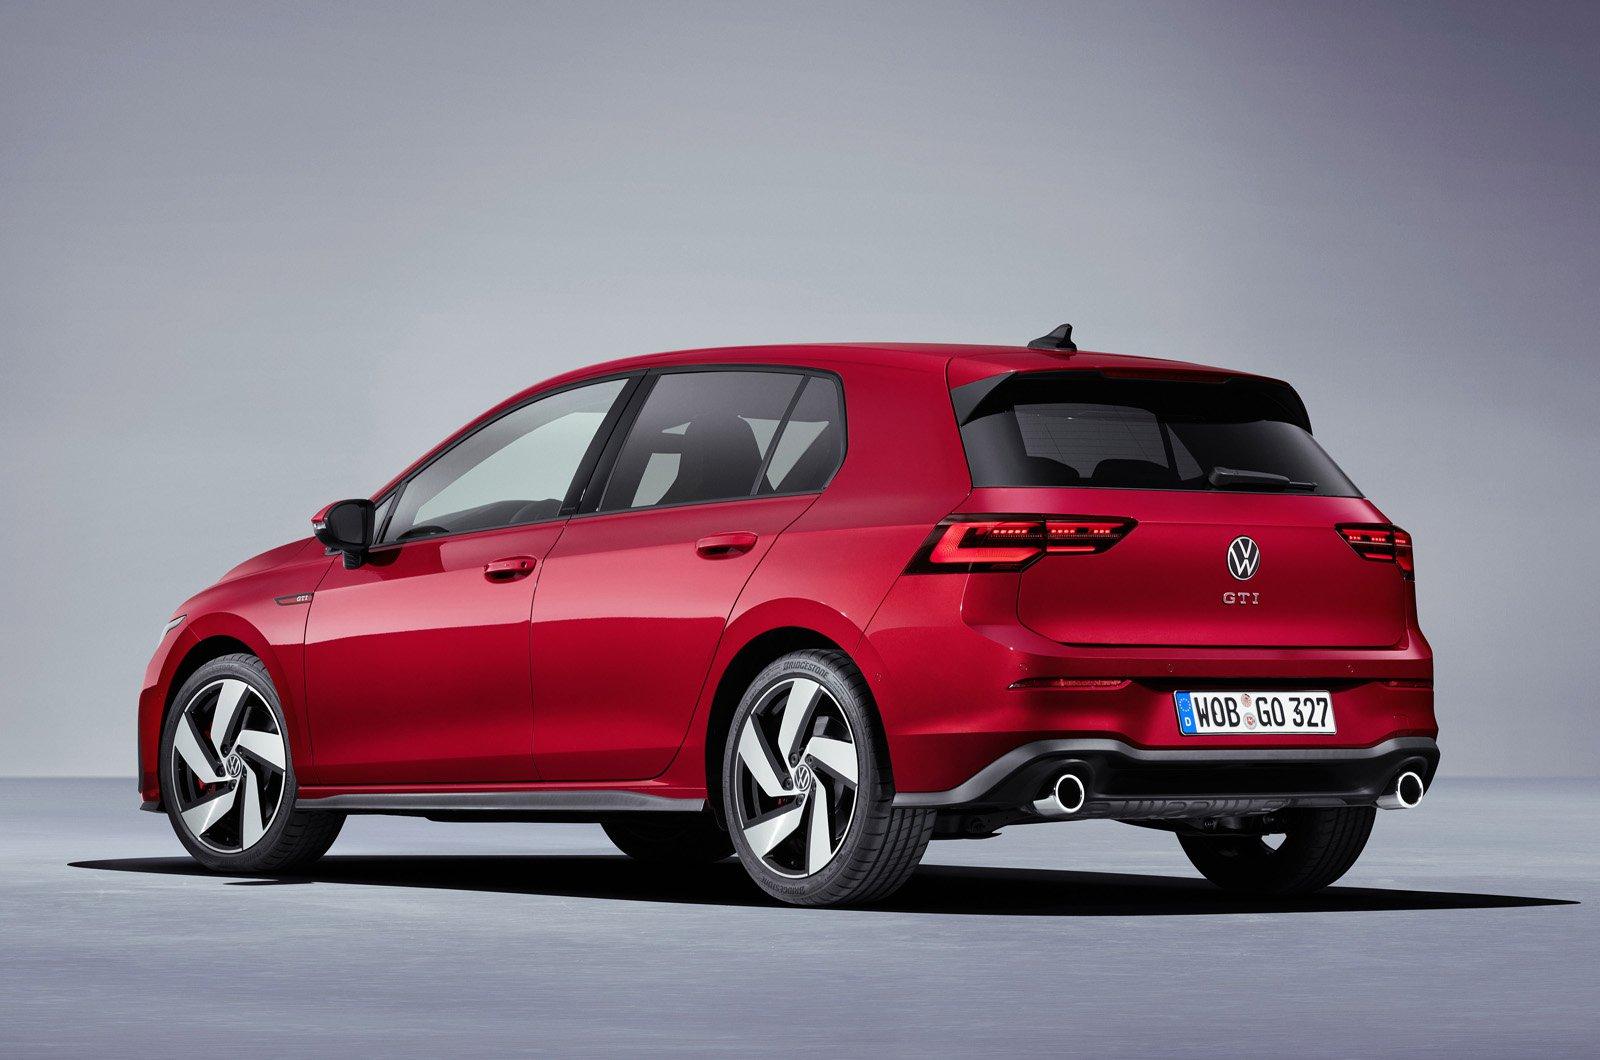 2020 Volkswagen Golf GTI rear